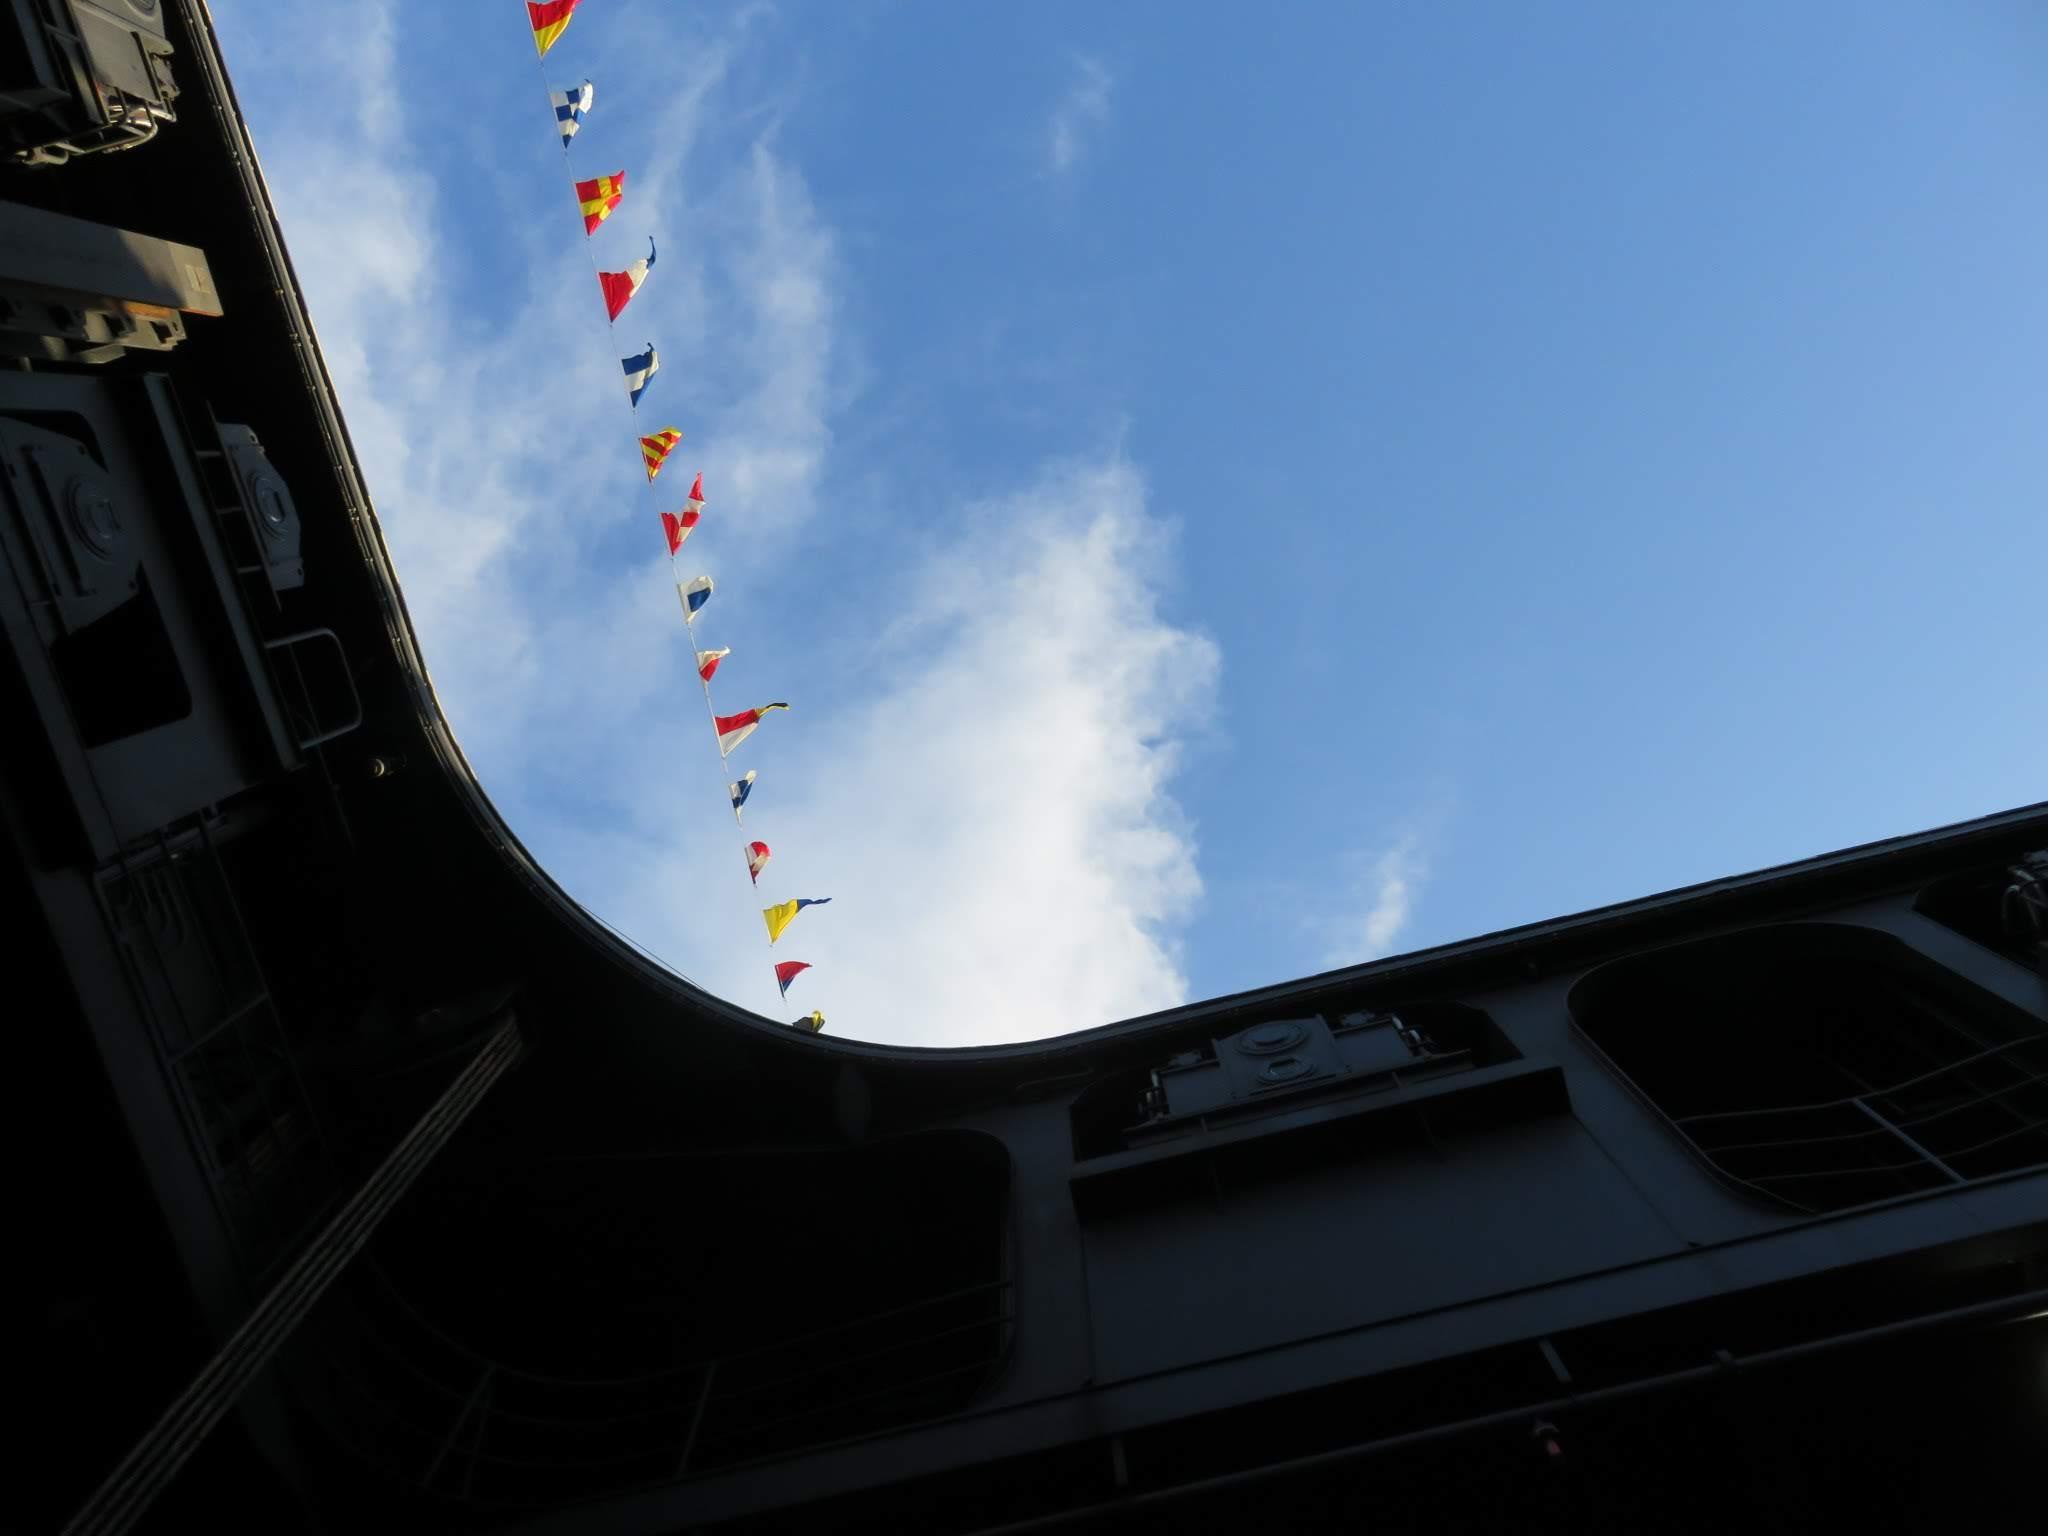 FLEETWEEK2019横浜 - 護衛艦「いずも」一般公開_a0057402_11271491.jpg